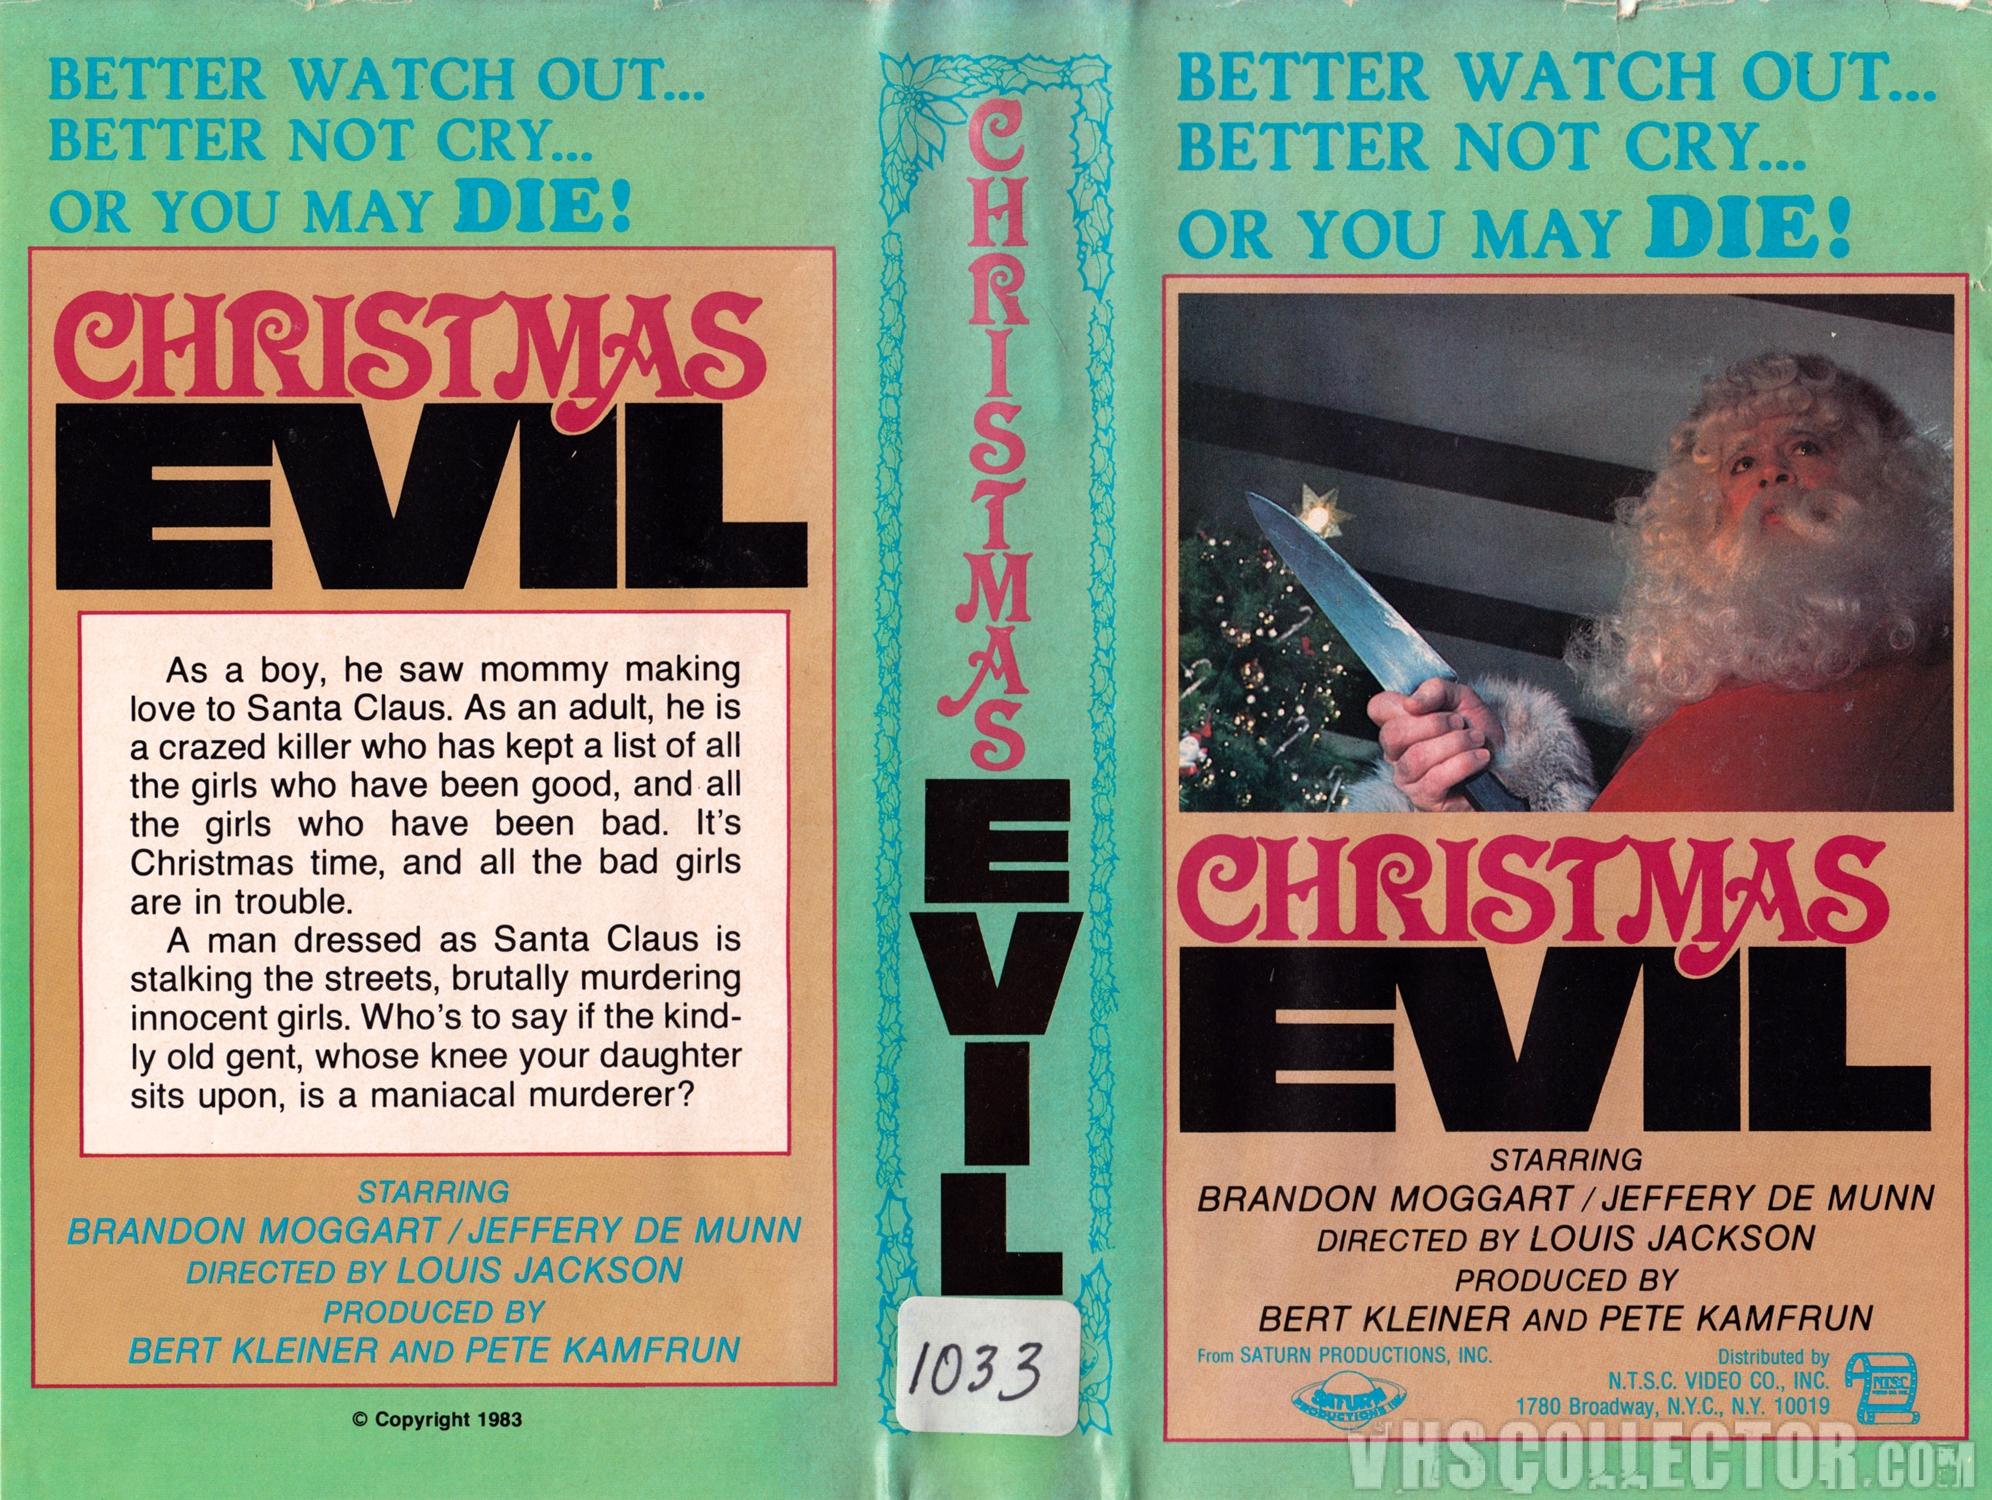 Christmas Evil 1980.Christmas Evil Vhscollector Com